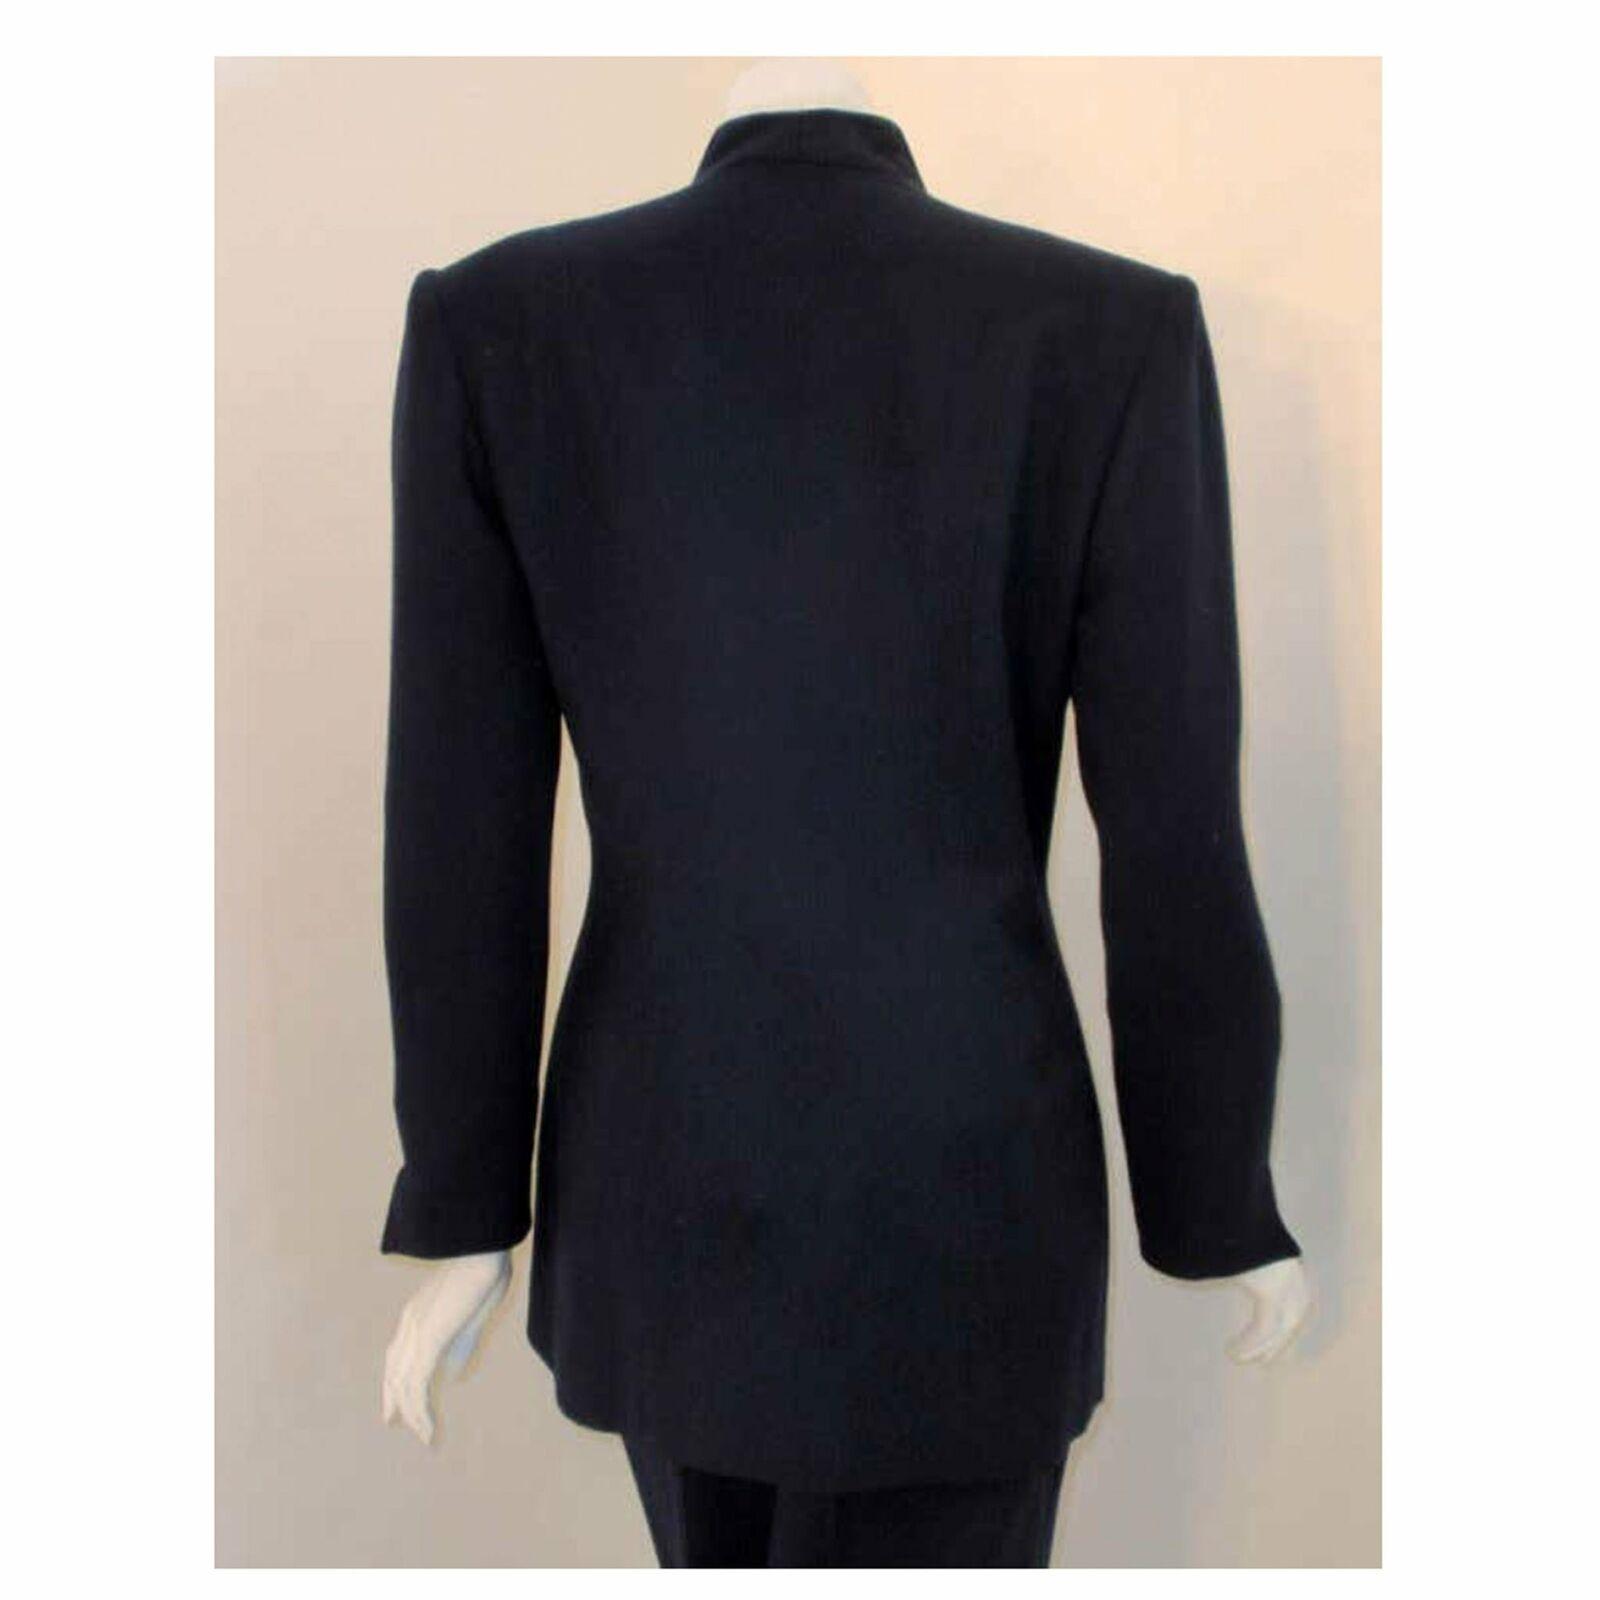 CHRISTIAN DIOR 1980s 2 pc Dark Blue Pant Suit - image 4